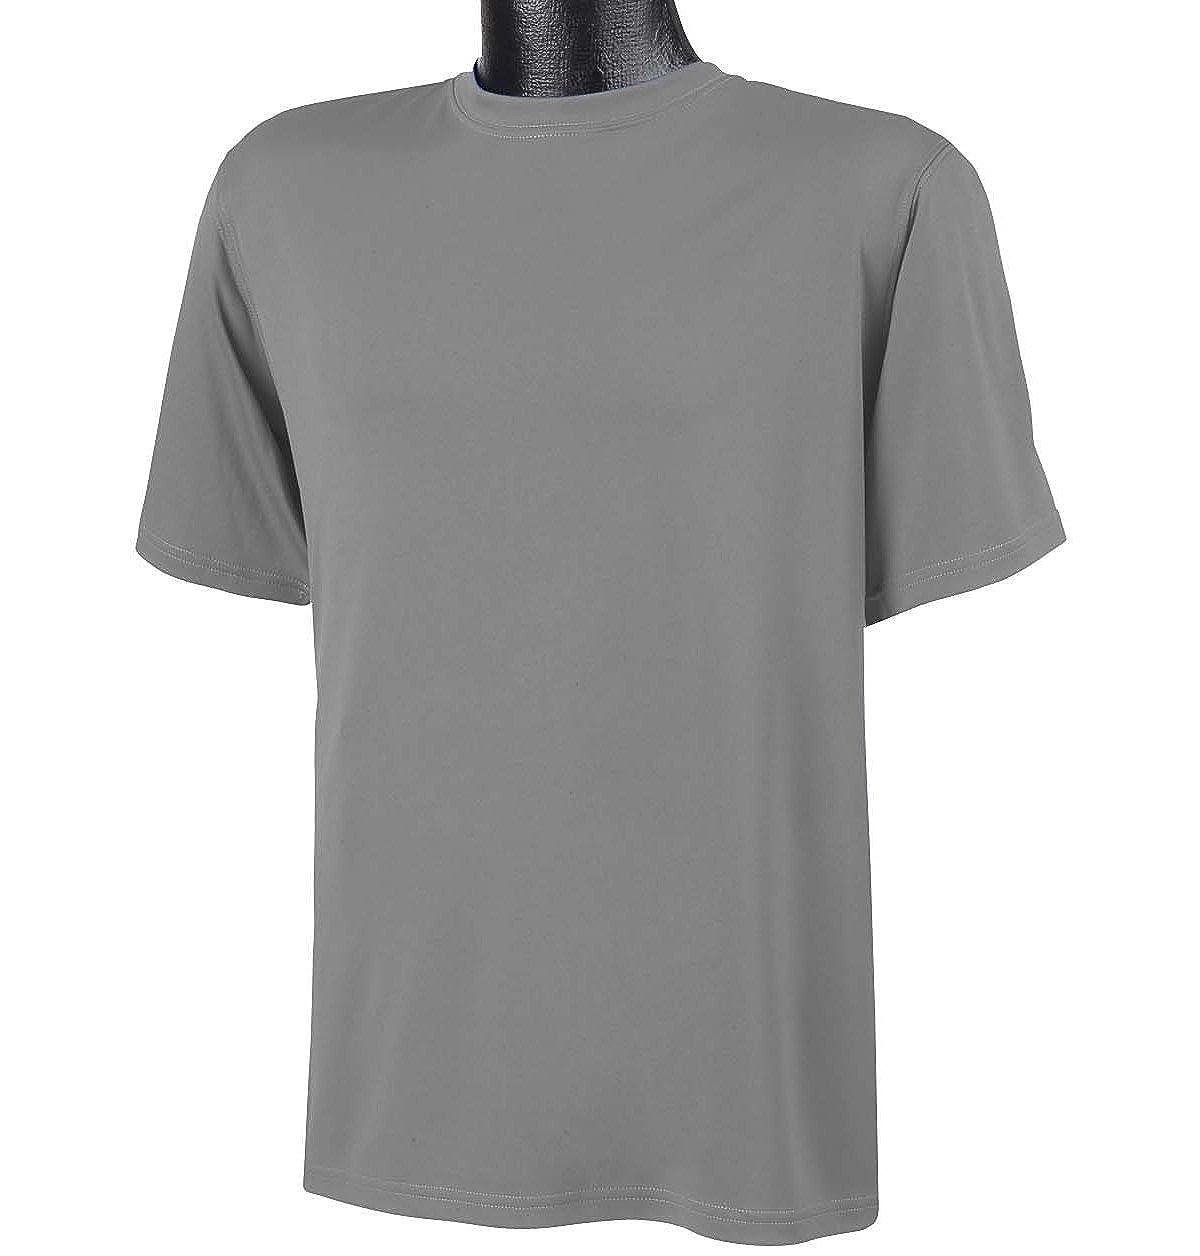 97f2c882 Amazon.com: Champion CW22 - Double Dry Performance T-Shirt: Clothing